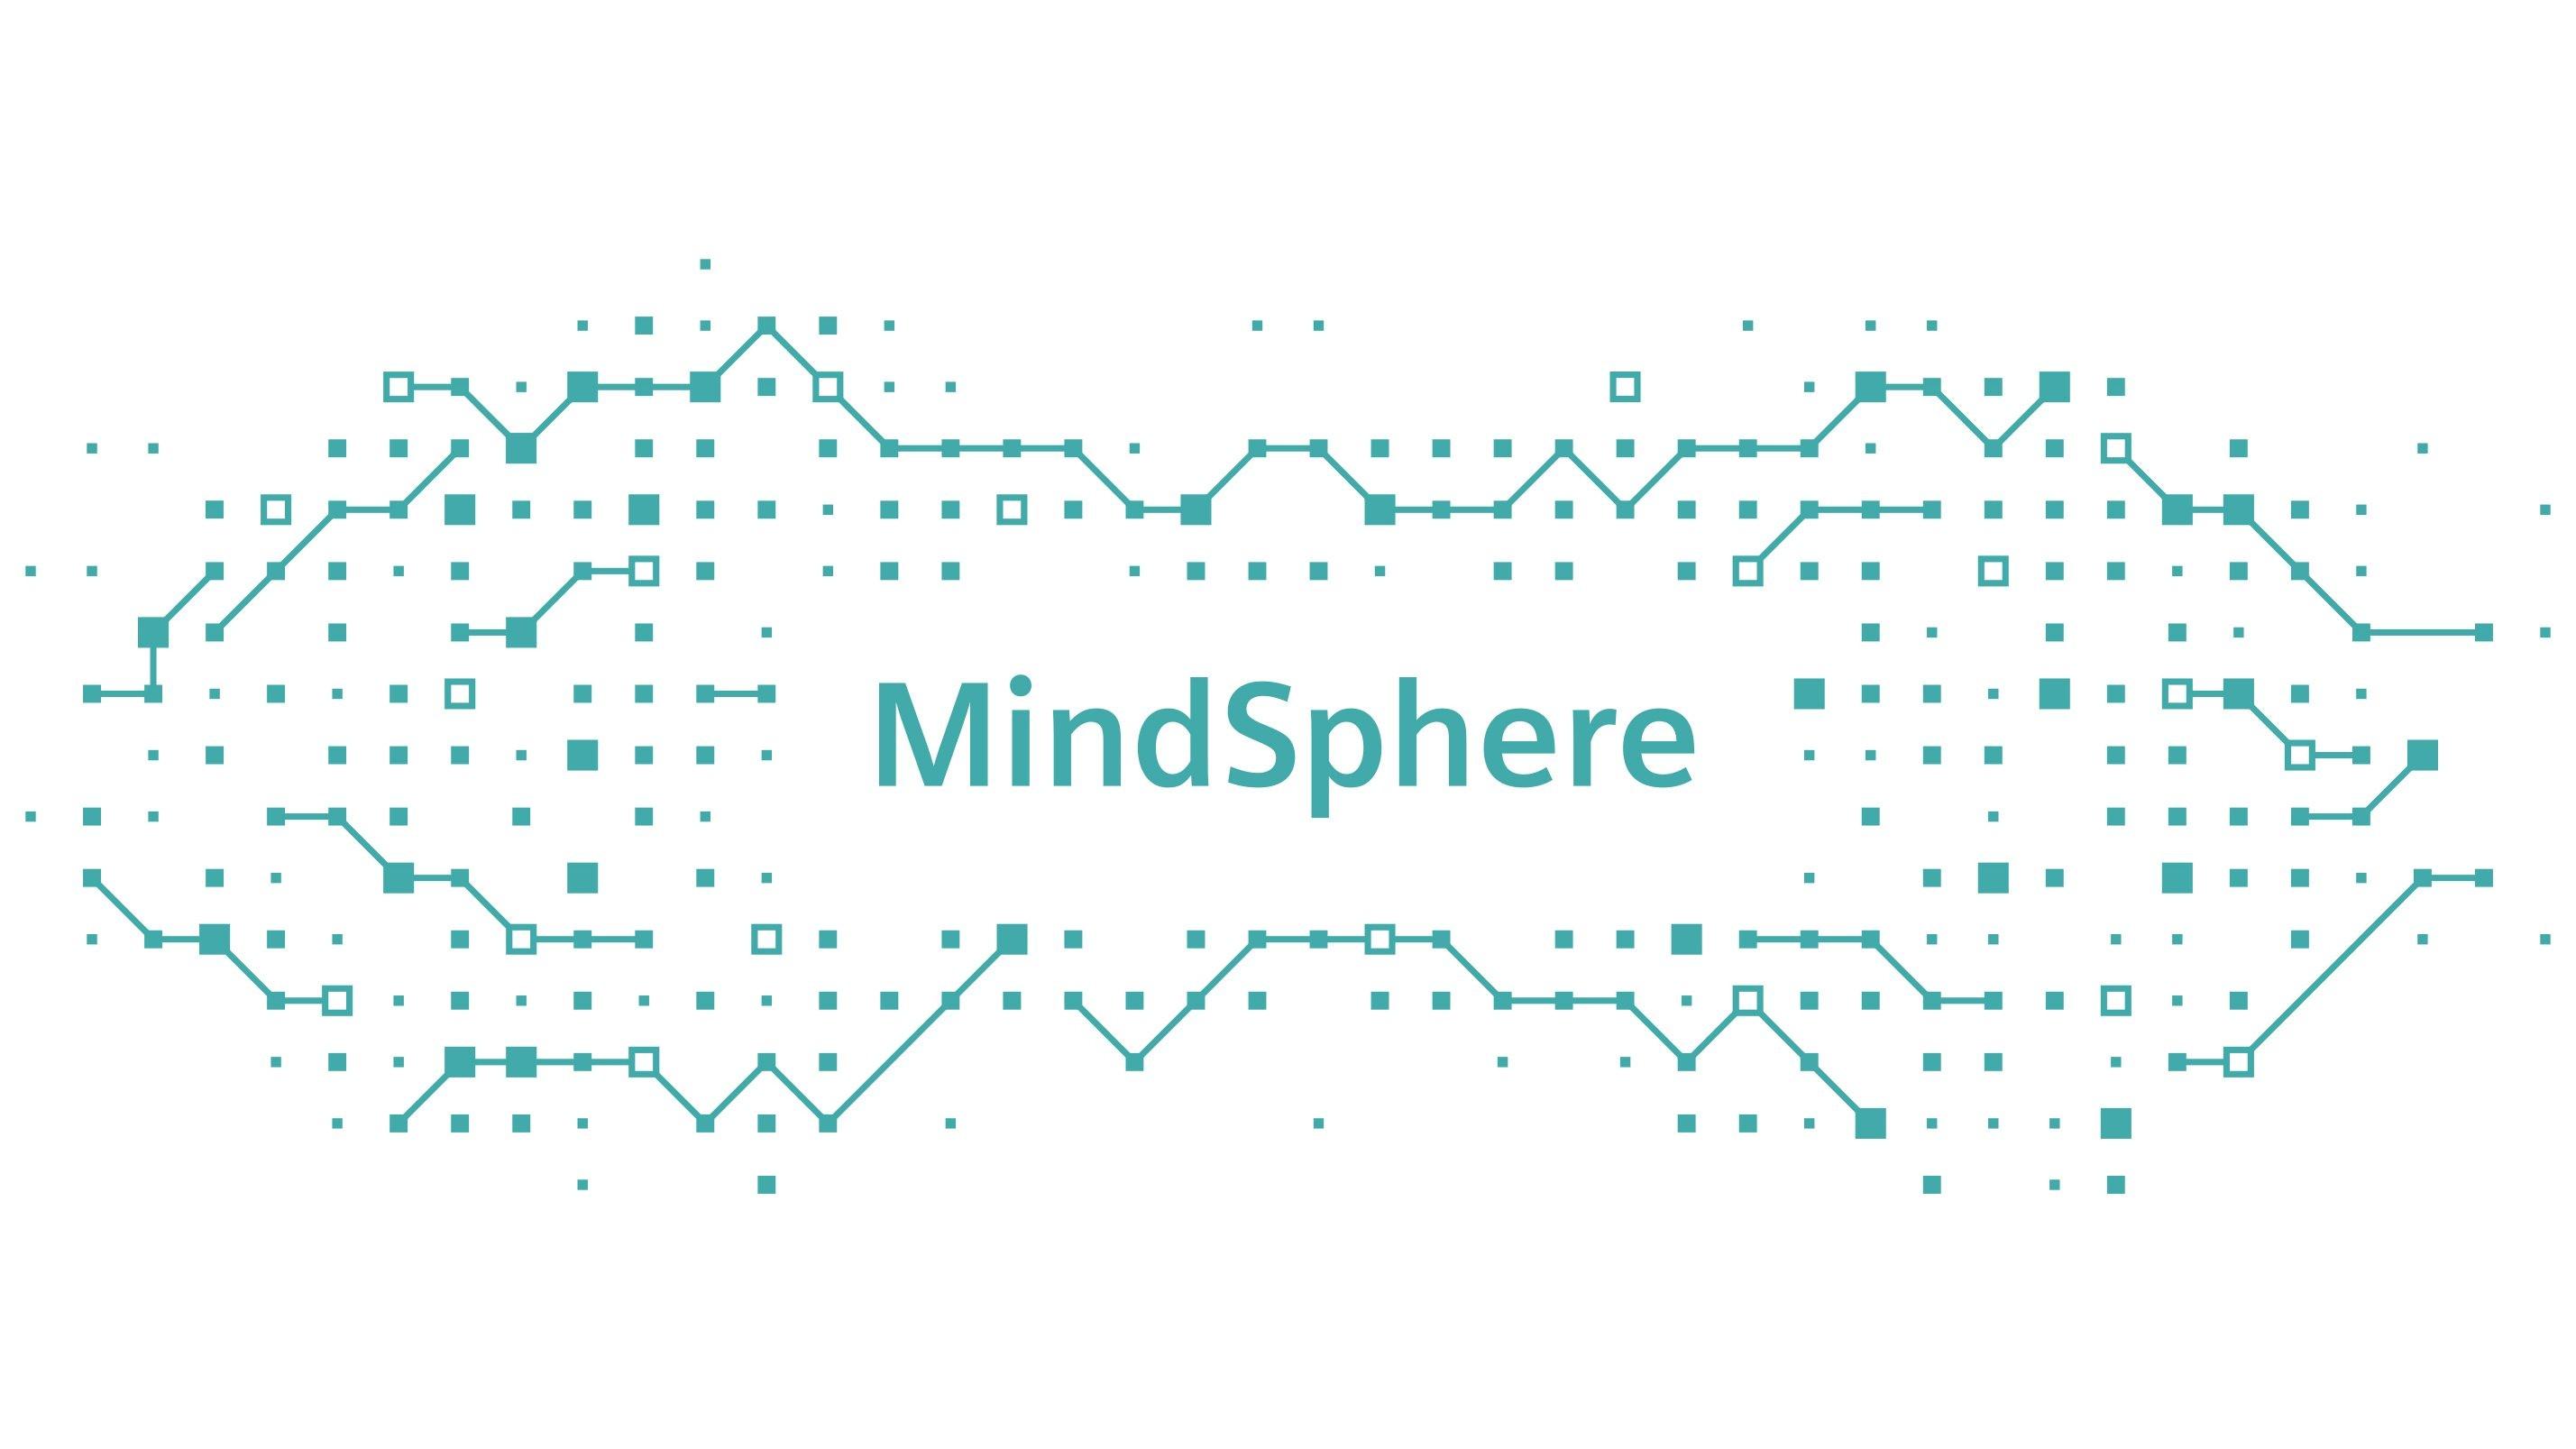 MindSphere – open IoT operating system | Software | Siemens